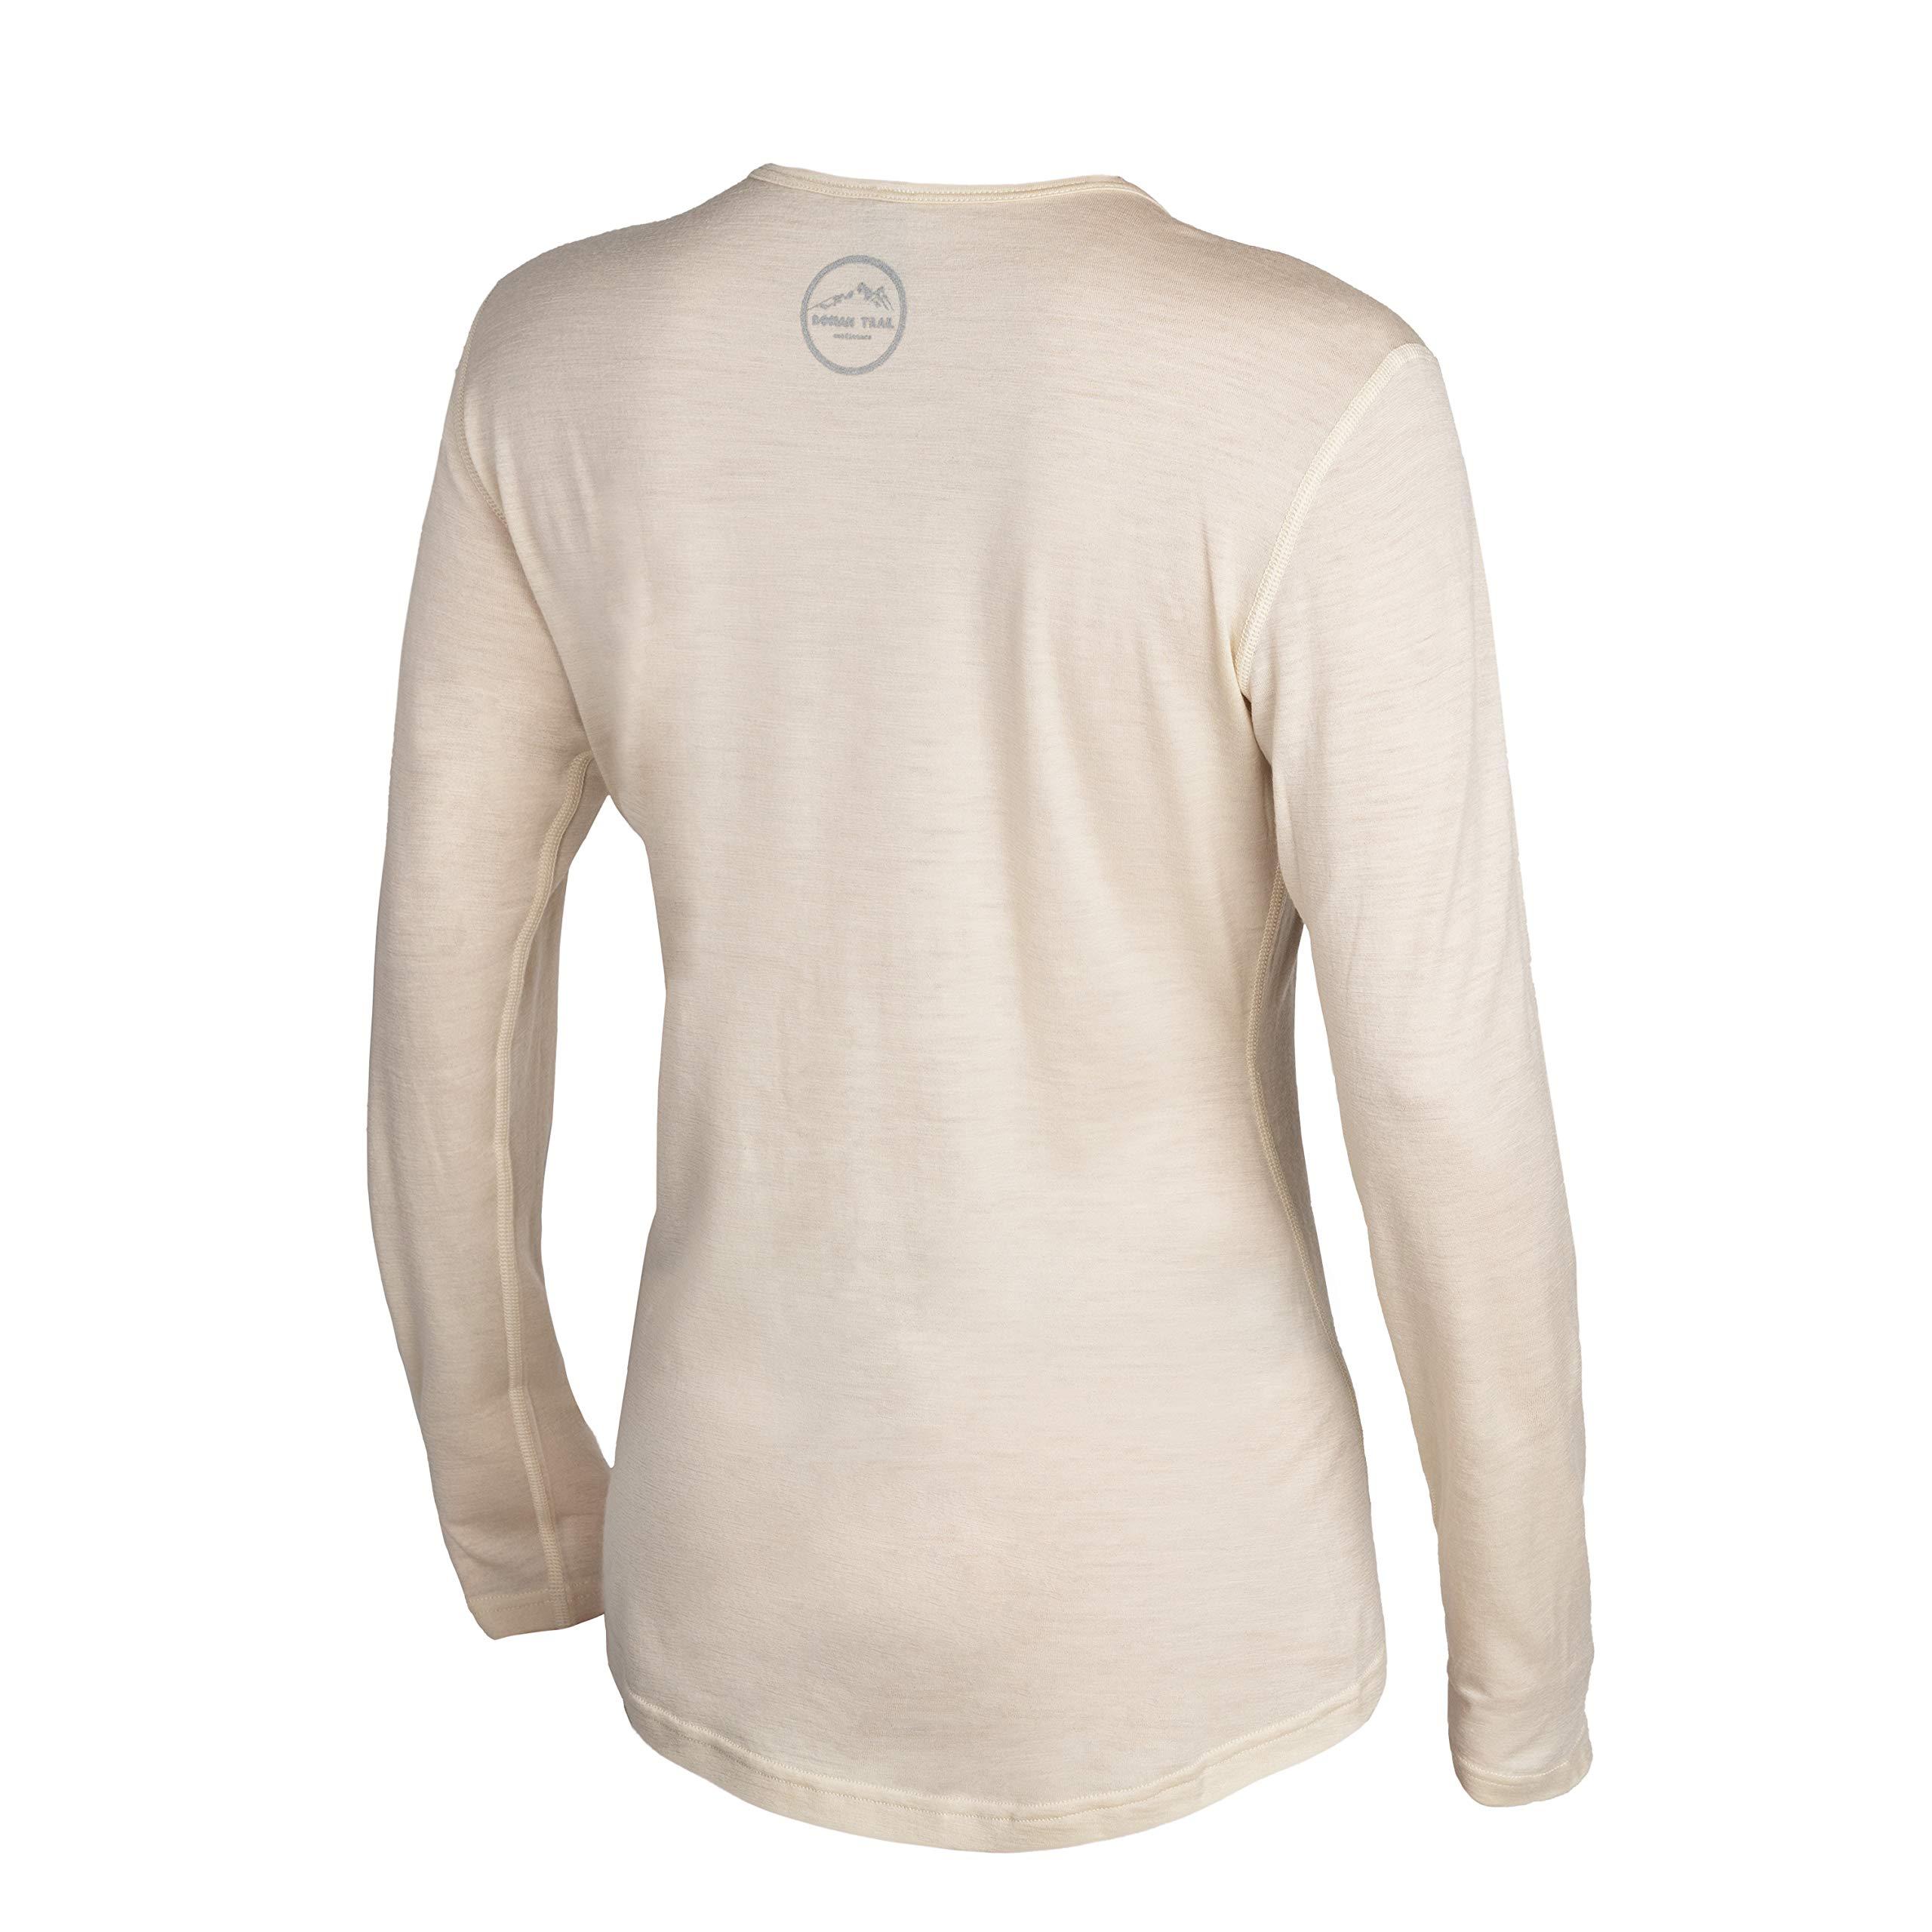 Western Owl Outfitters Merino Wool Women's Long Sleeve Top |Crew Neck Shirt | Lightweight | Moisture Wicking | Base Layer (Medium, Cloud Cream)